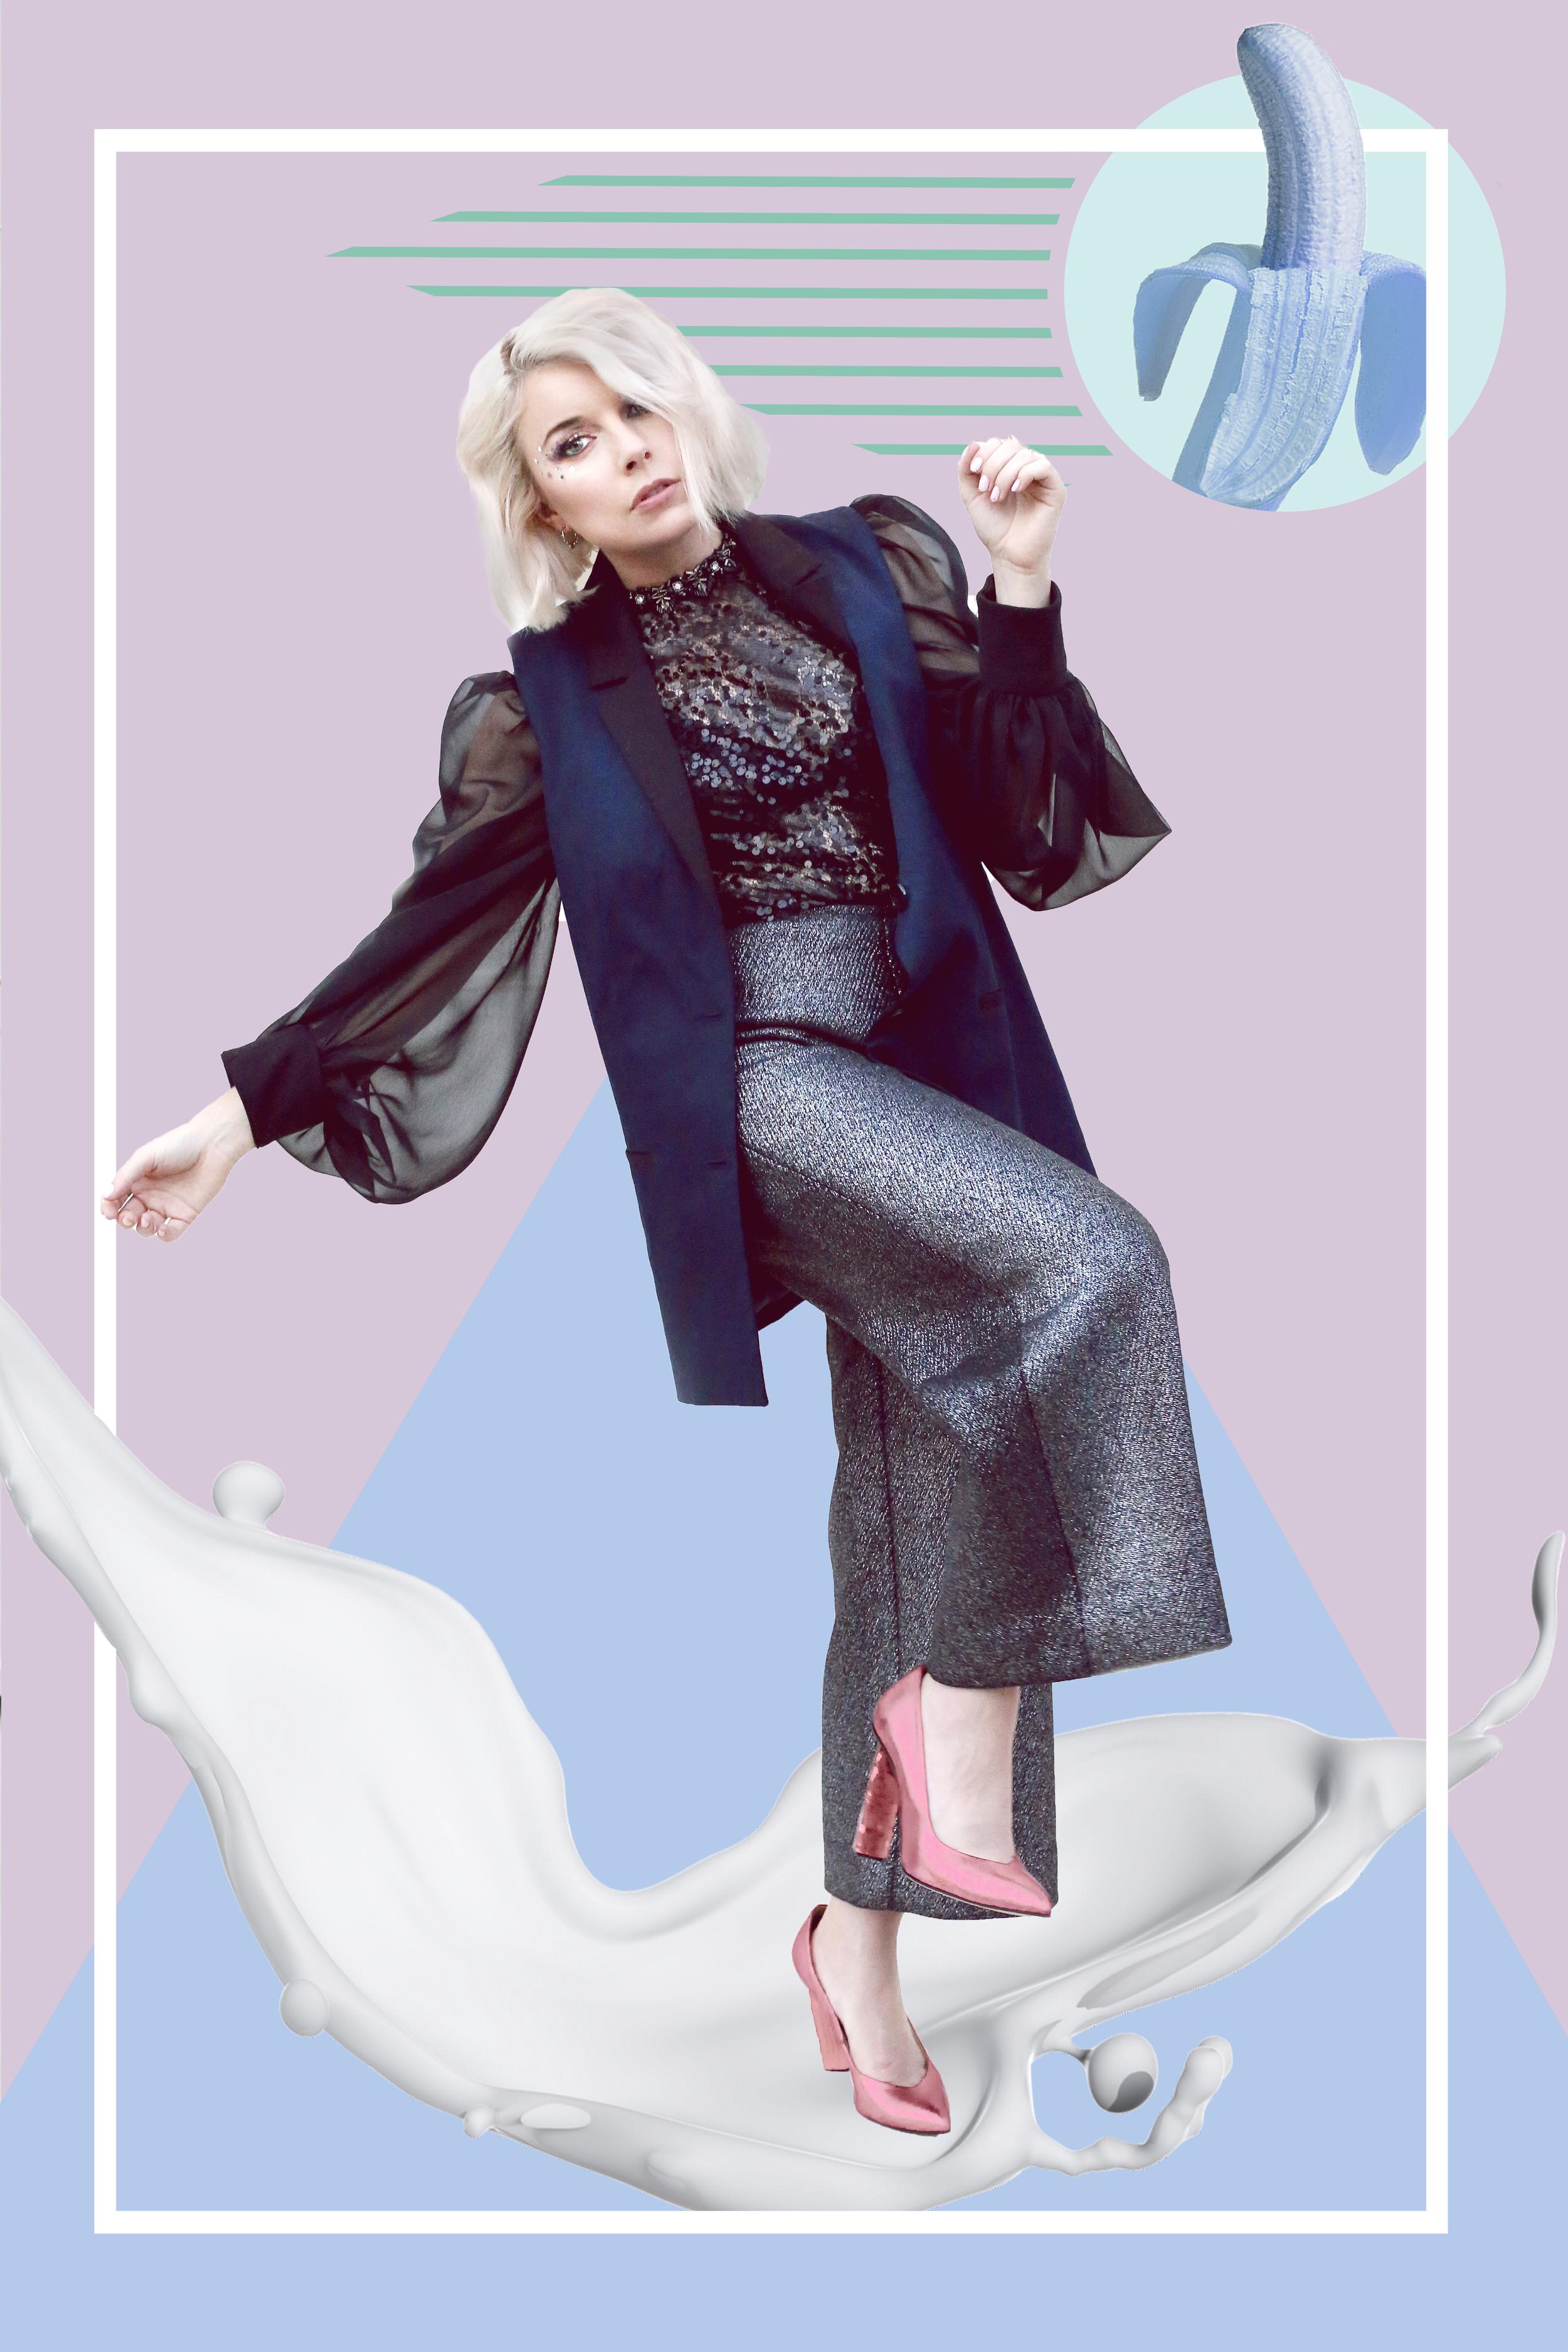 blouse & pants, Emily Daccarett. vest, Rue 58. jewelry, Amarillo. shoes, Melis Yildiz.